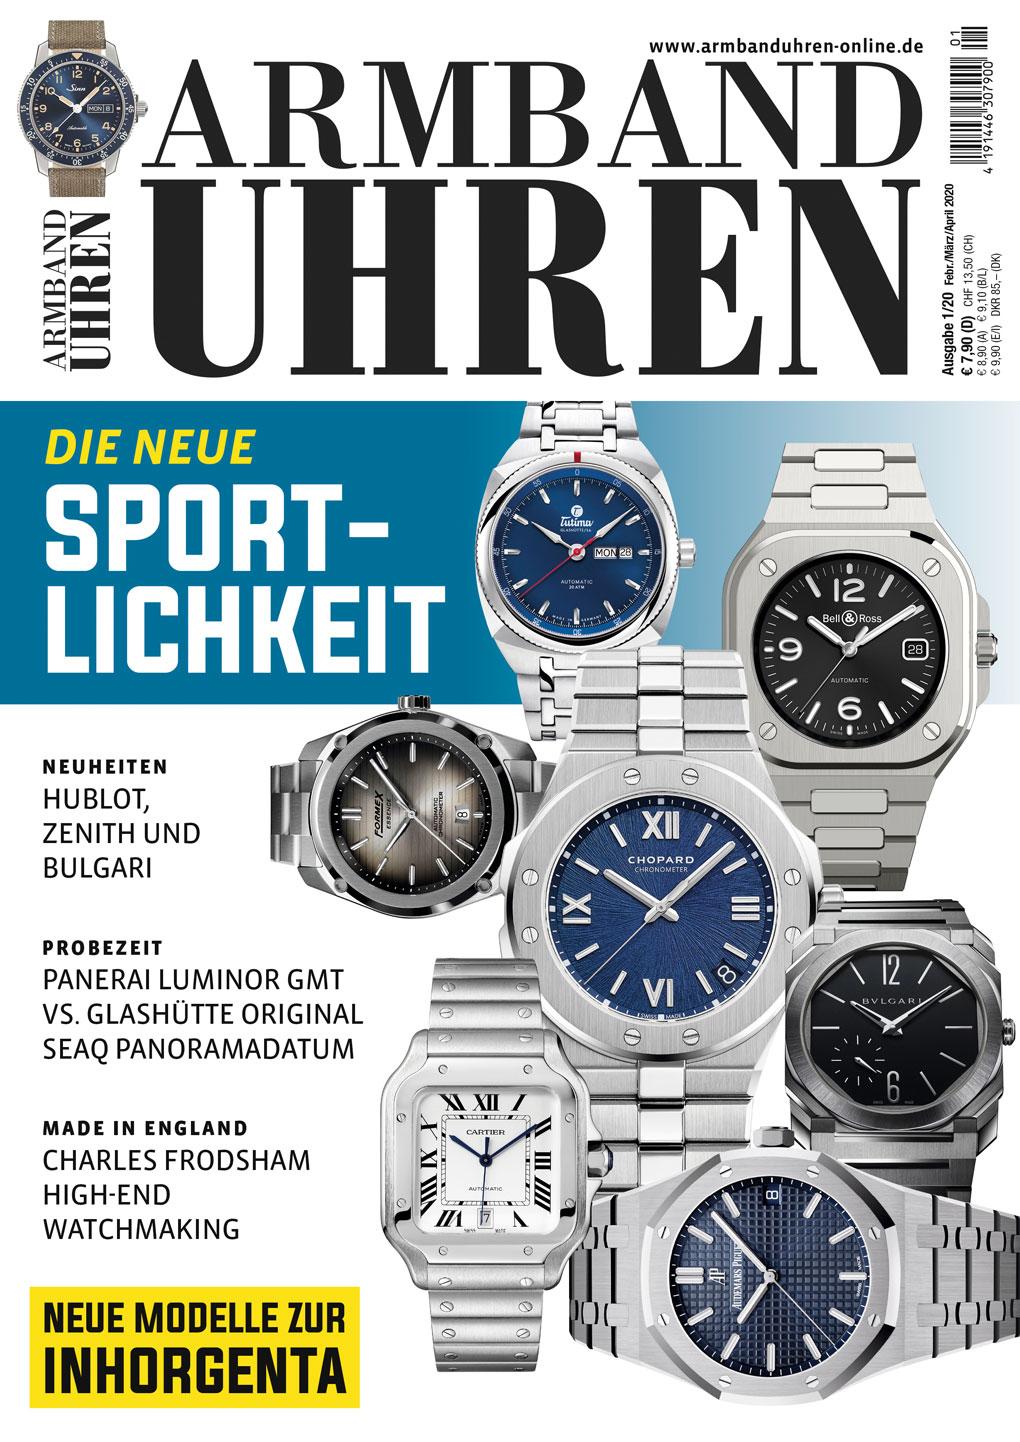 Cover des Magazins Armbanduhren Ausgabe Nr. 1 aus 2020